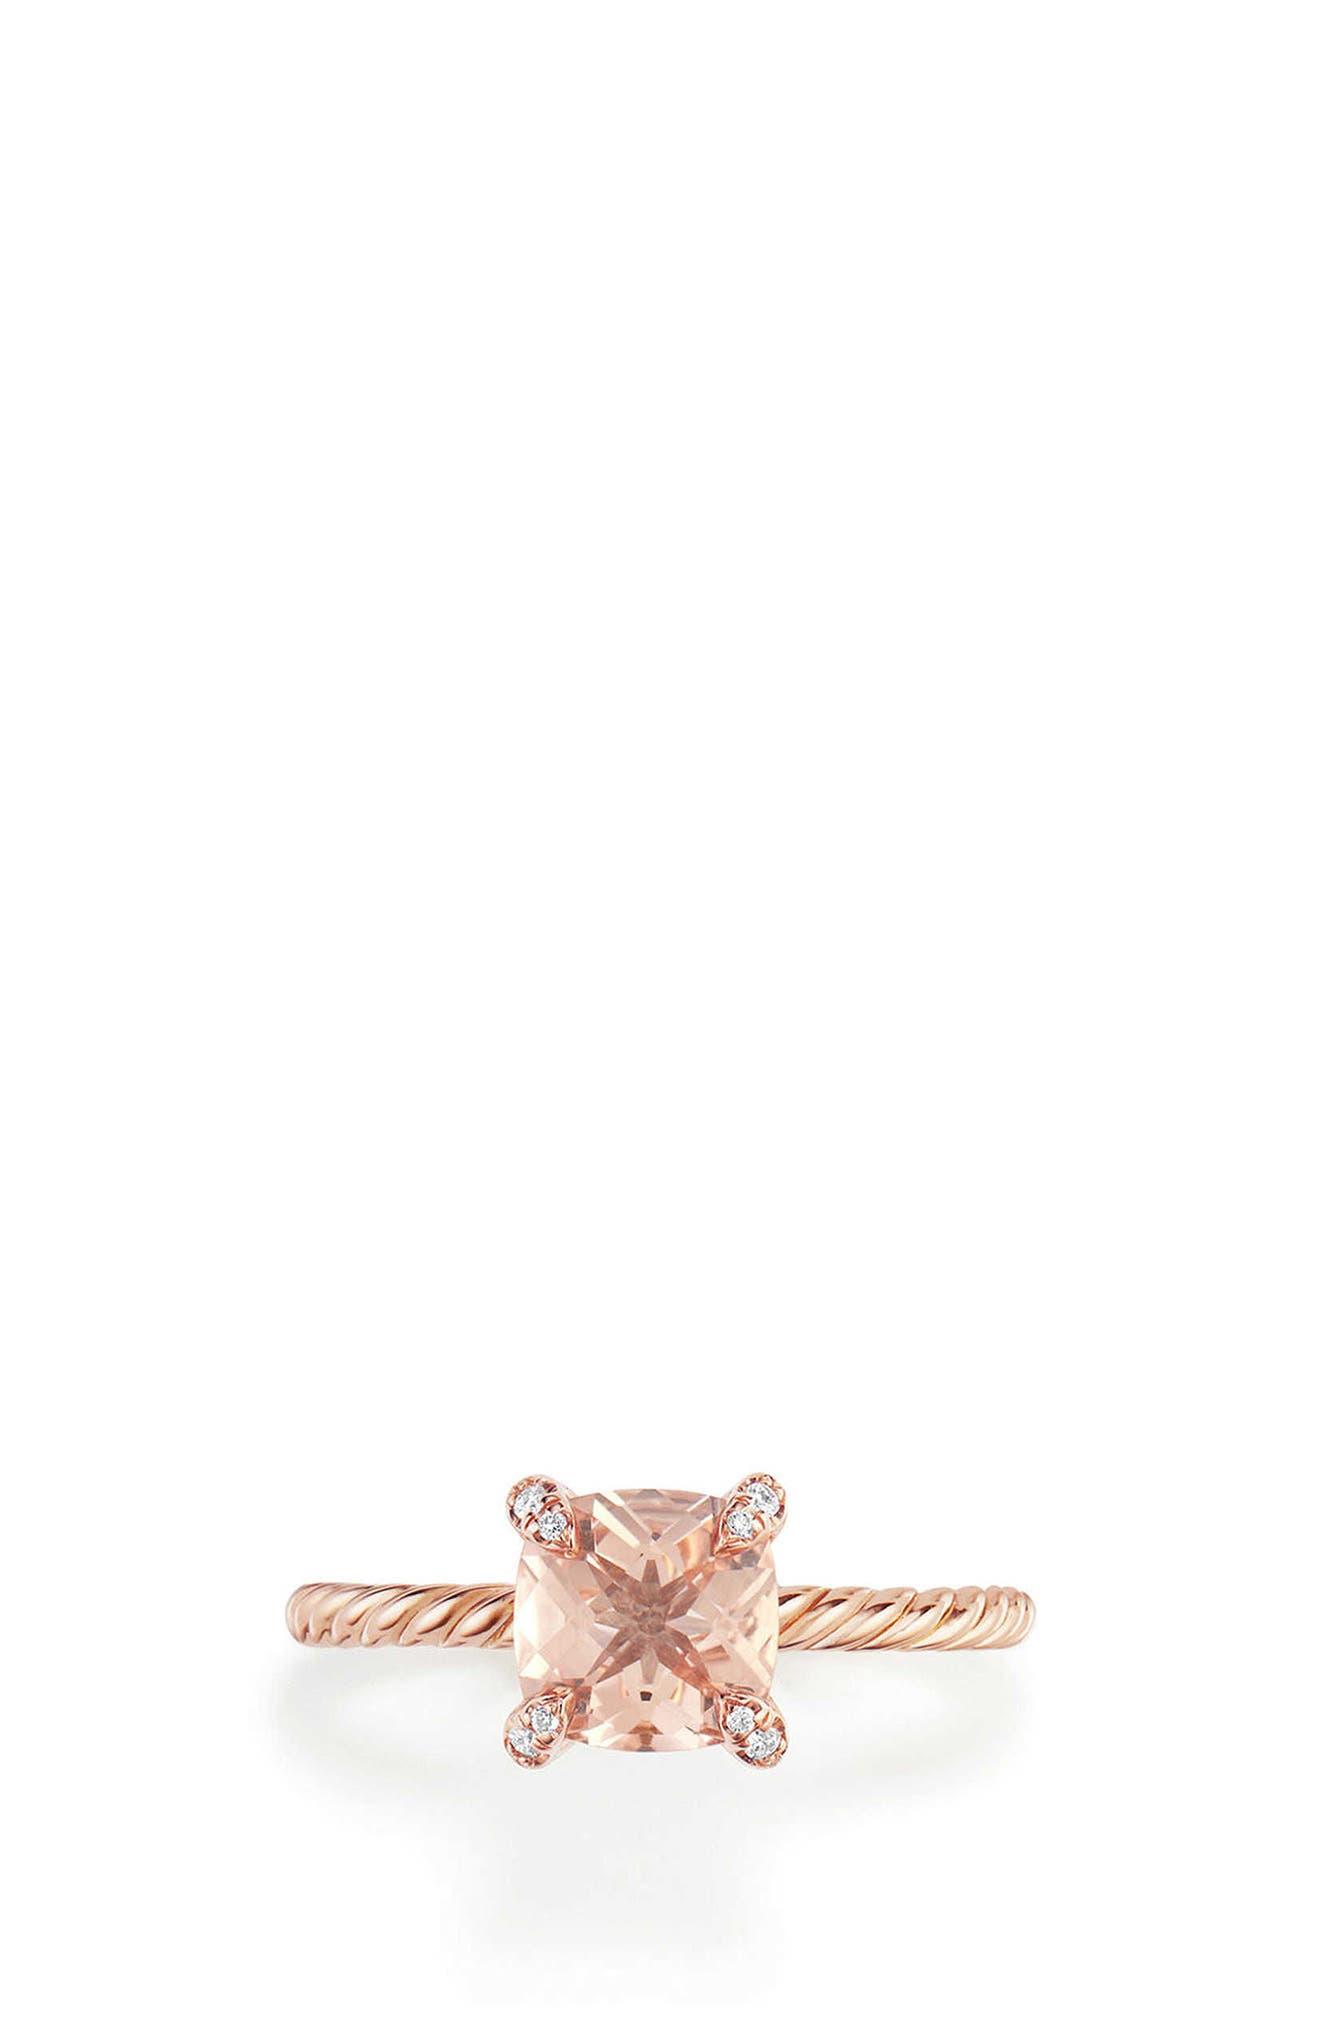 DAVID YURMAN Chatelaine Ring with Morganite and Diamonds in 18K Rose Gold, Main, color, ROSE GOLD/ DIAMOND/ MORGANITE